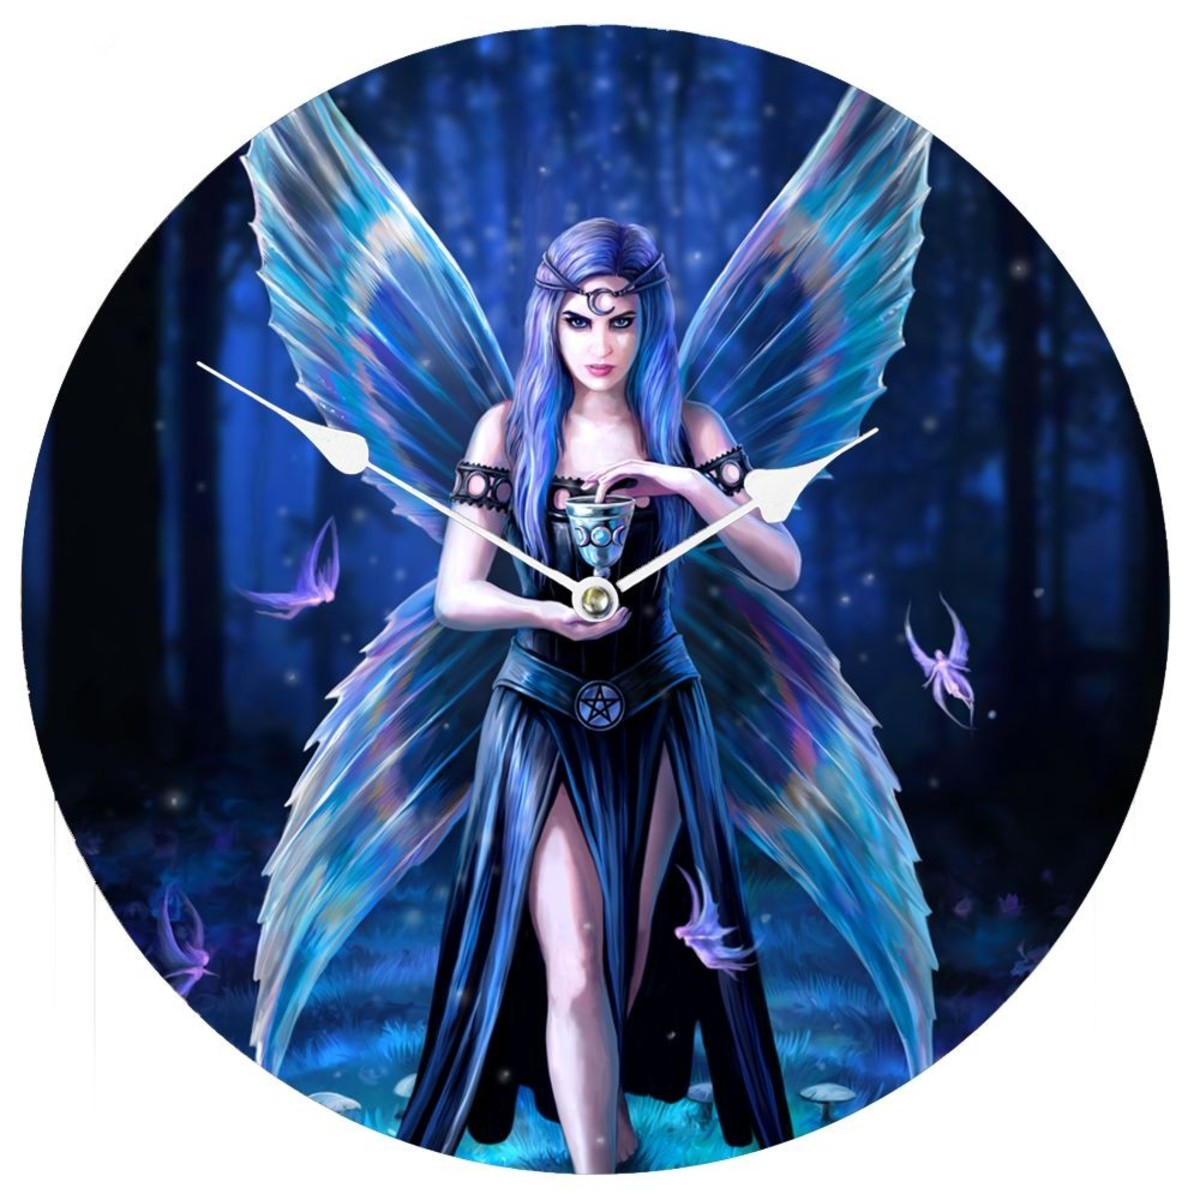 hodiny Enchantment - B3365J7